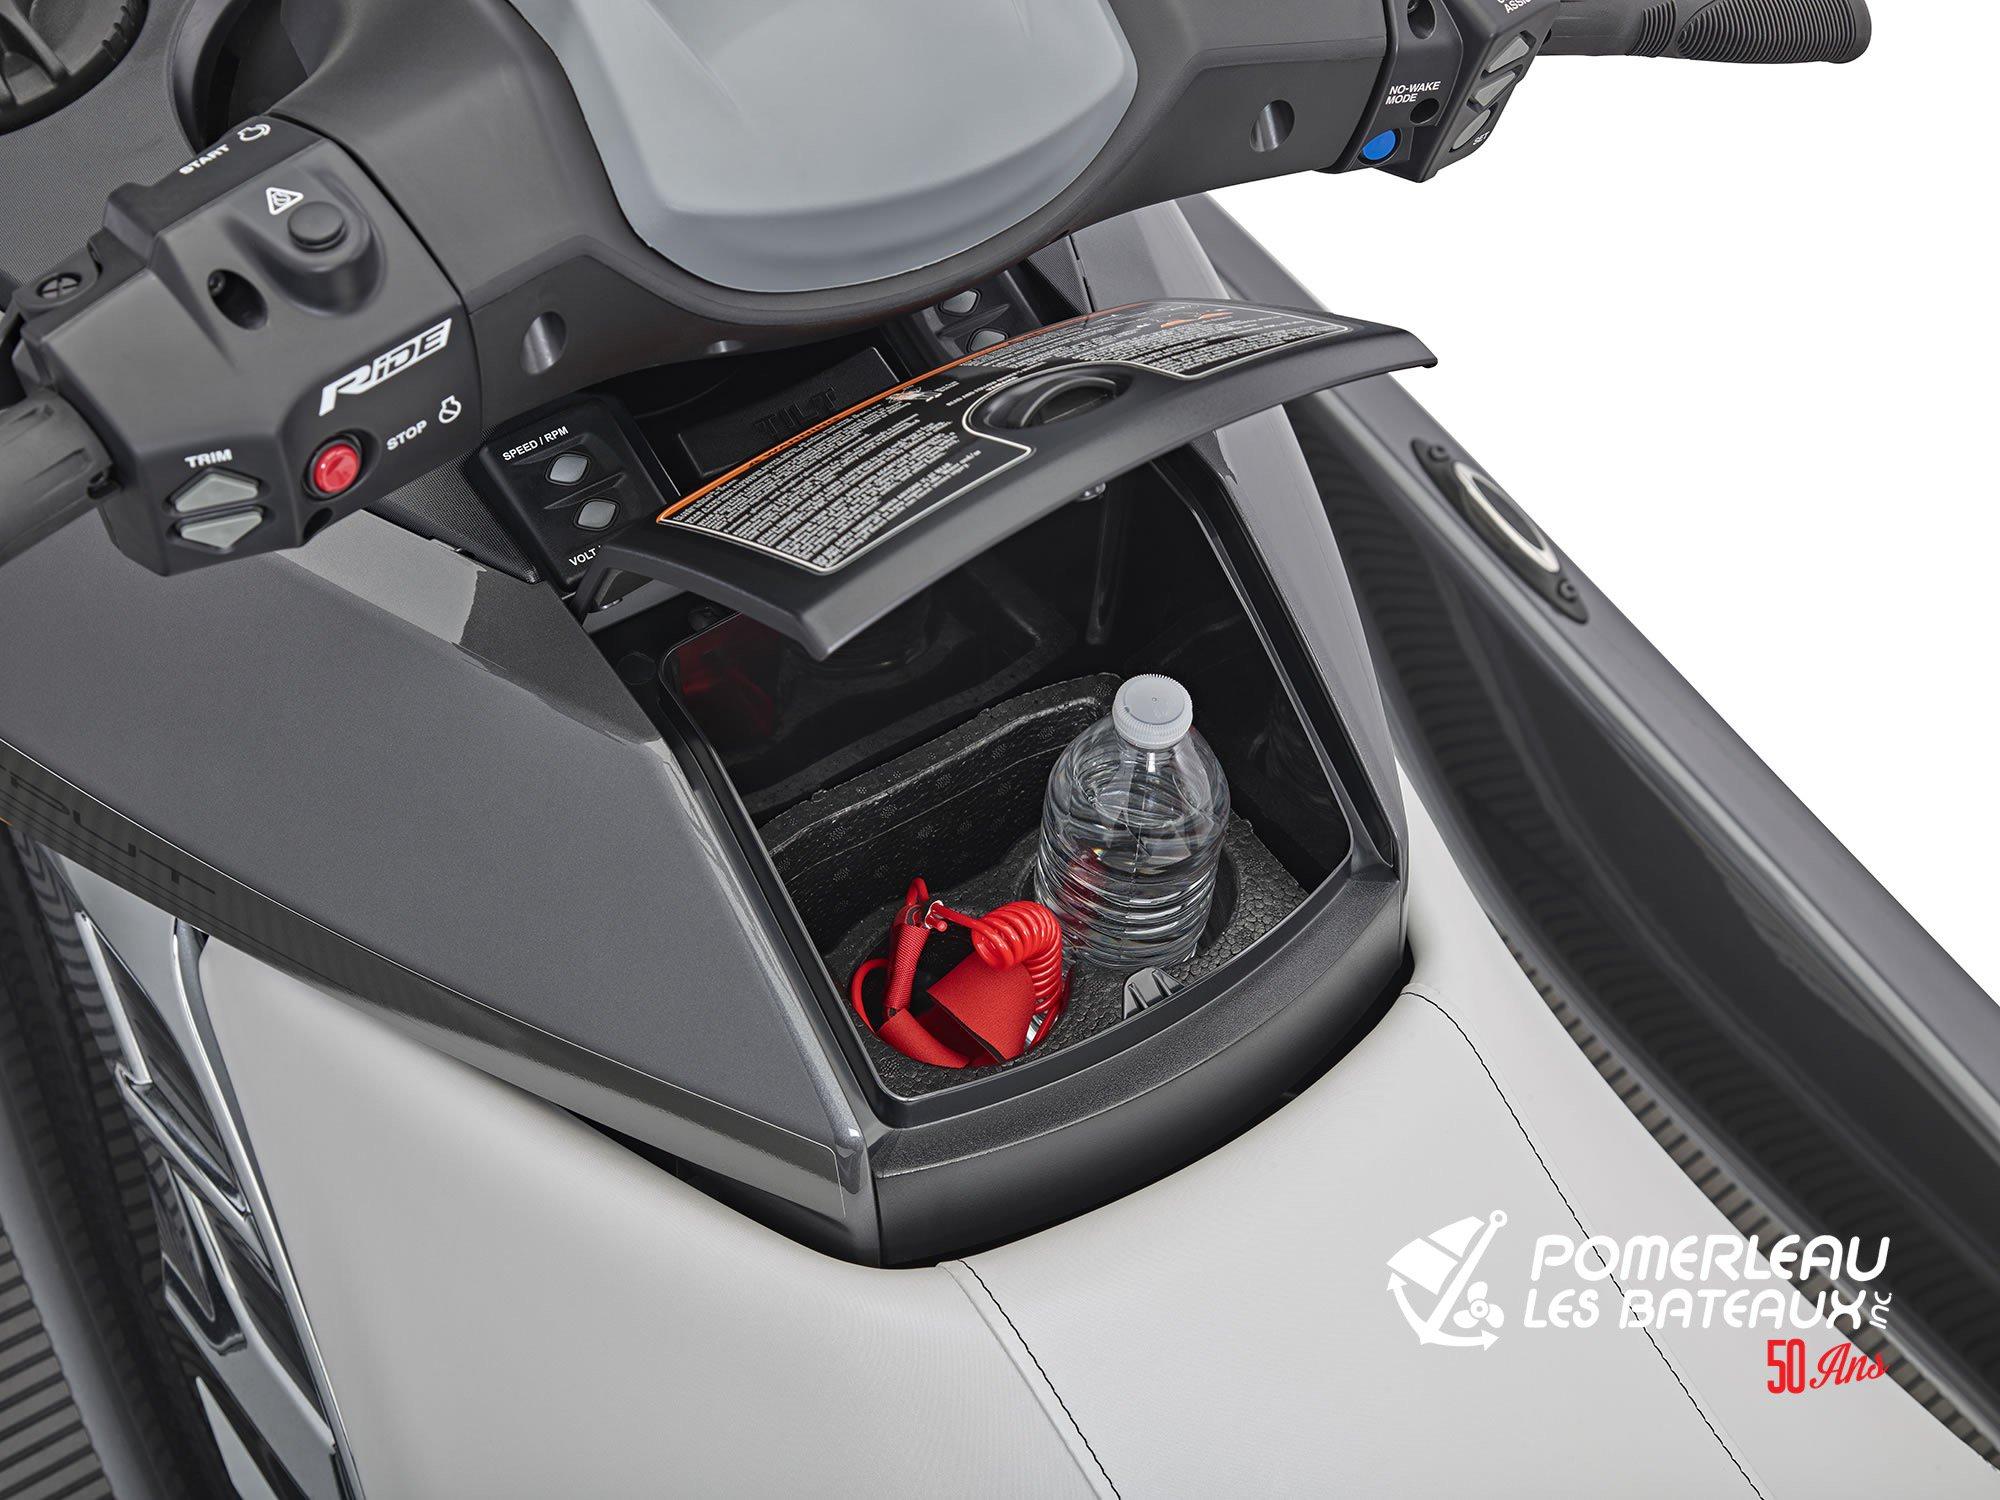 Yamaha FX Cruiser HO - 2018-FX-Cruiser-HO-Gray-Glovebox_l